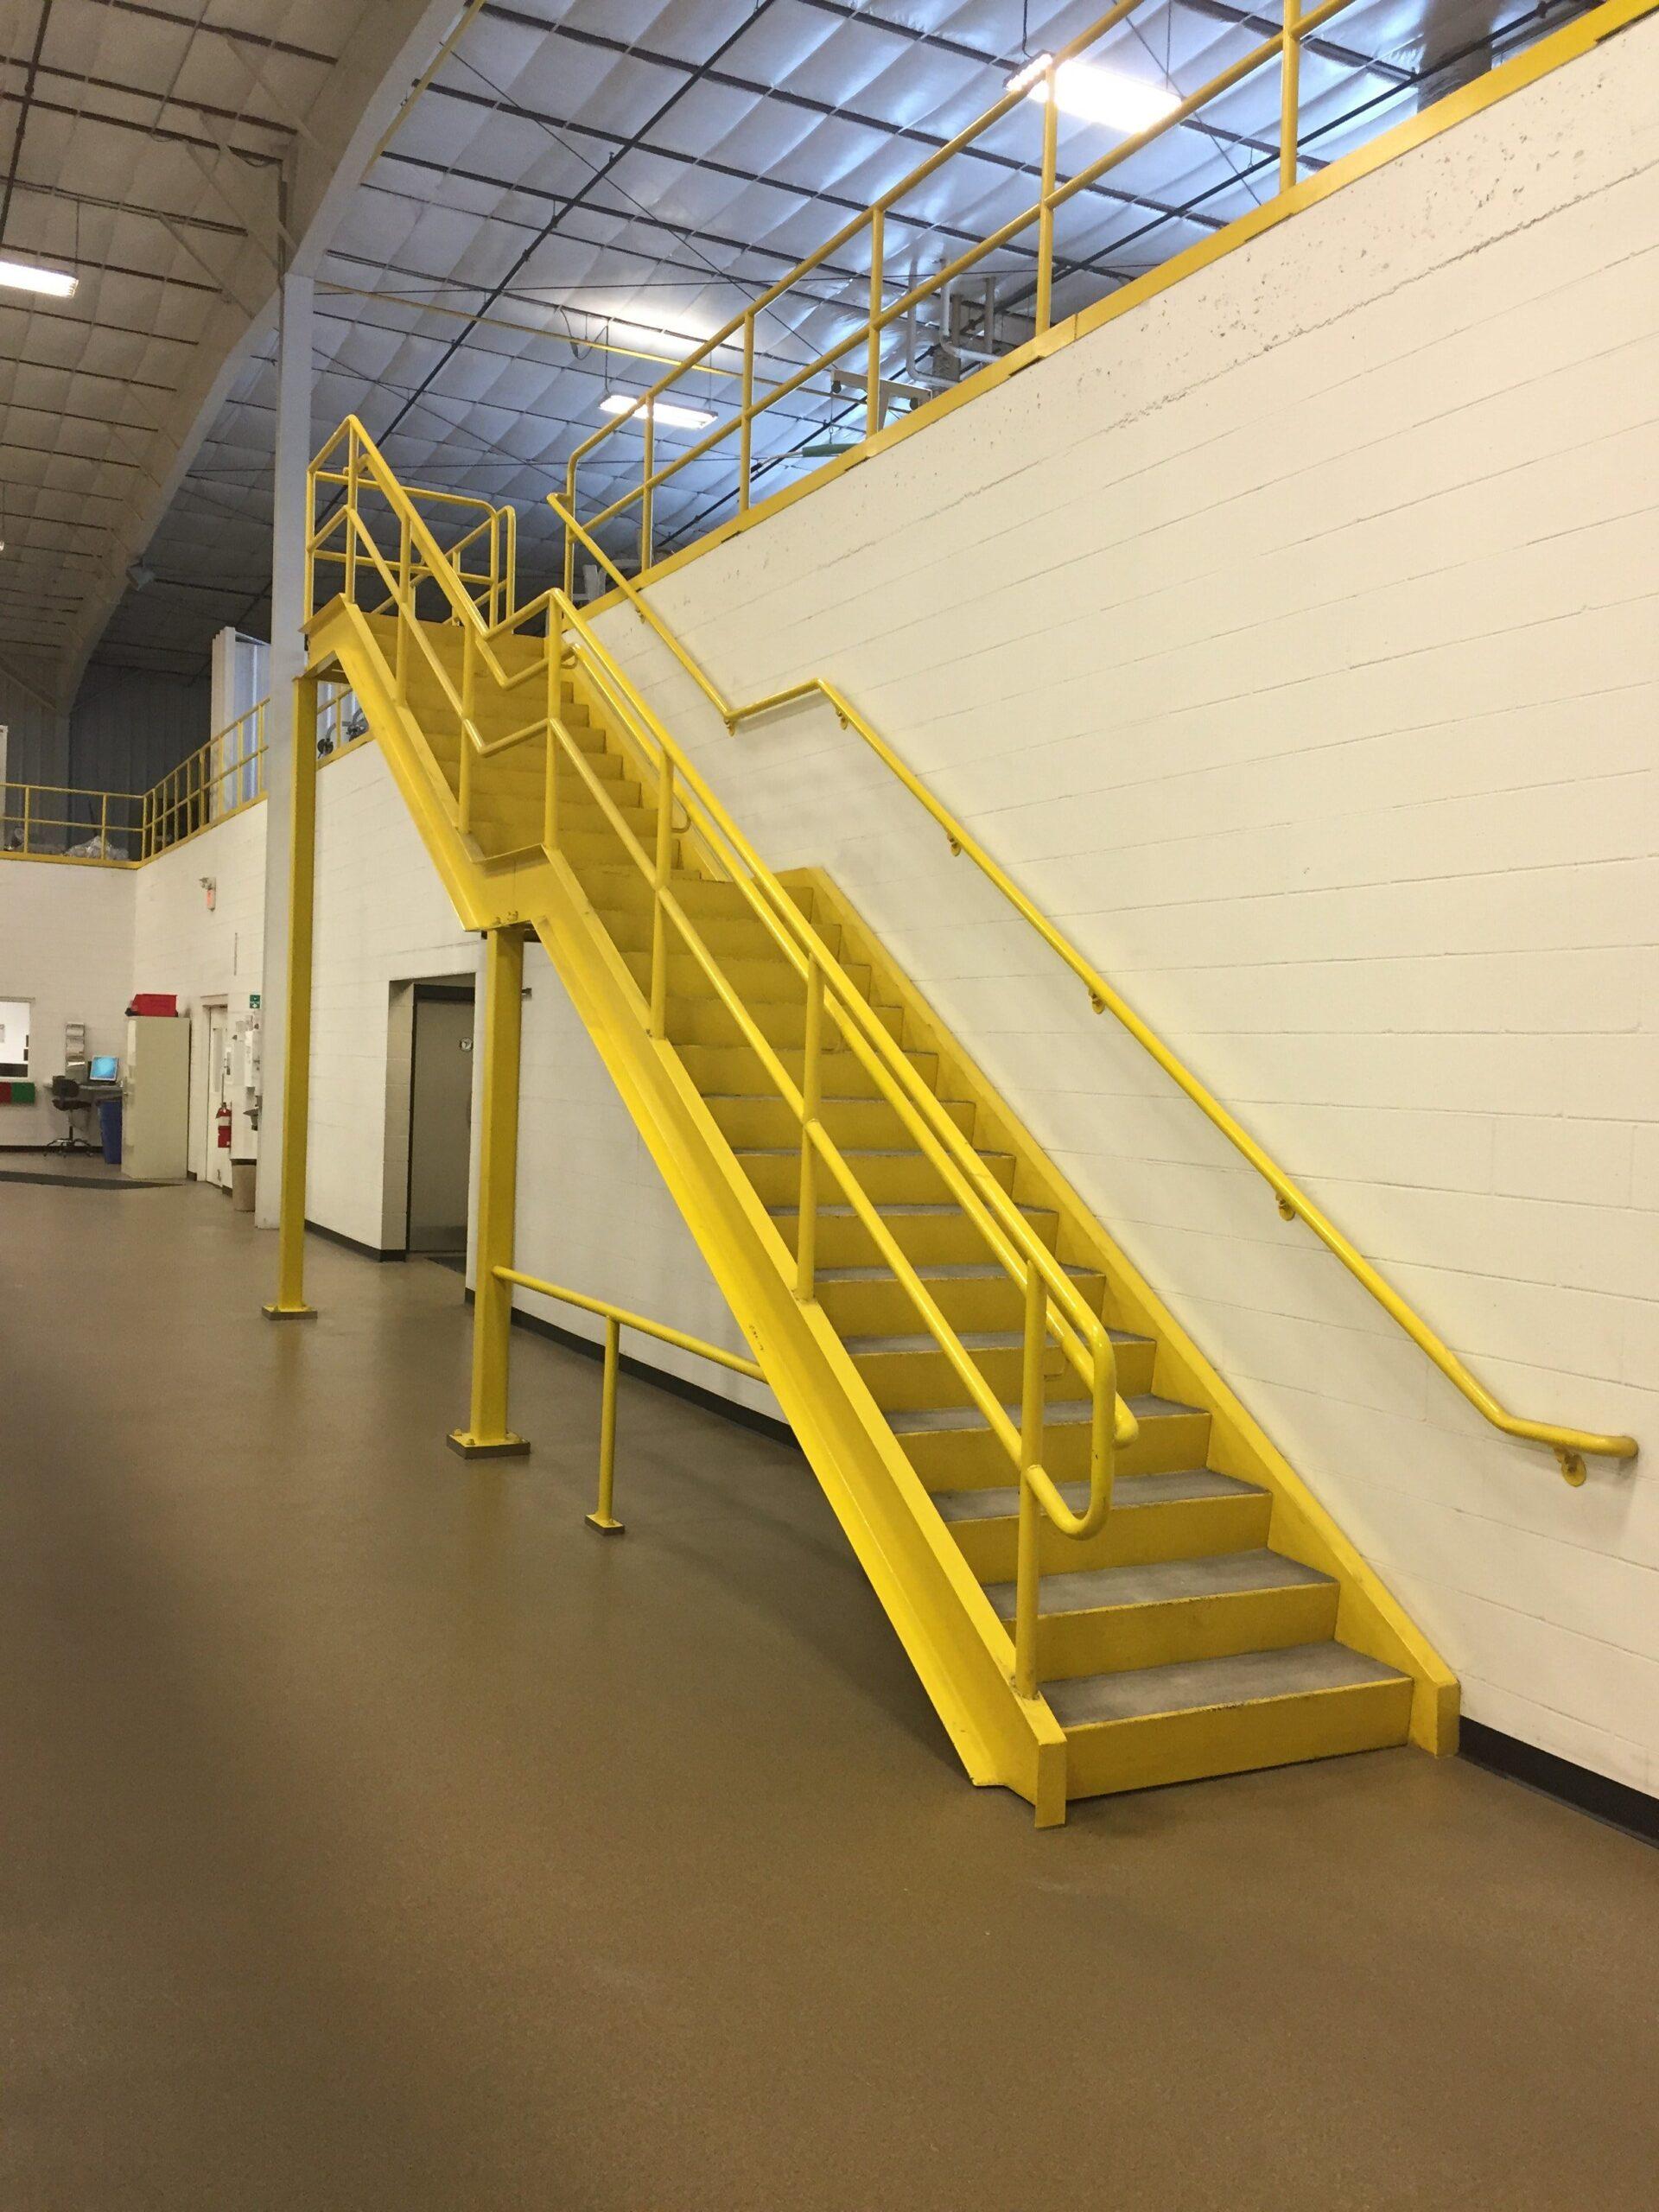 mezzanine platforms